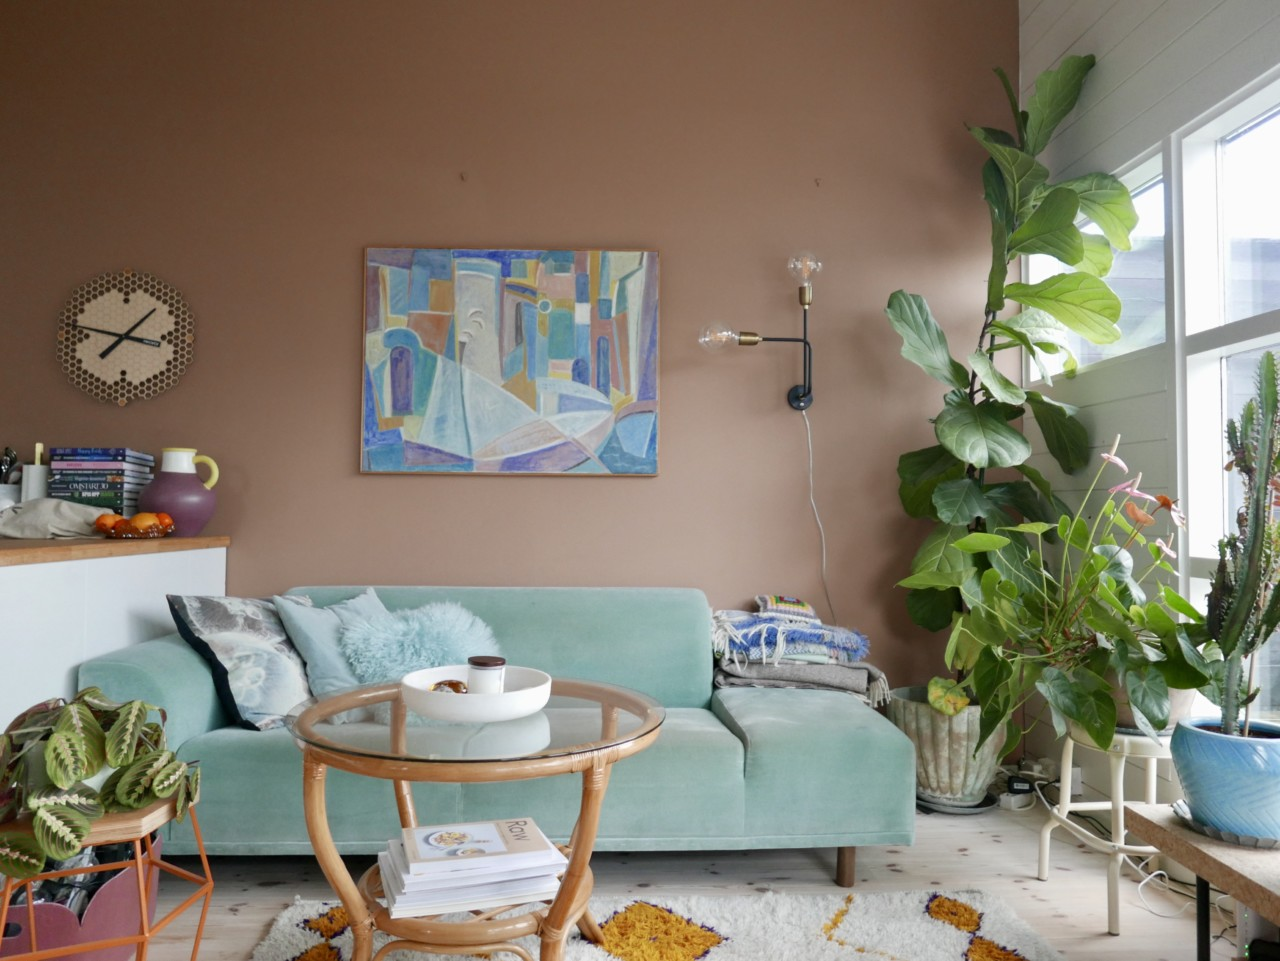 greenhouse-eco-living-room-stue-savanna-sunset-jungel